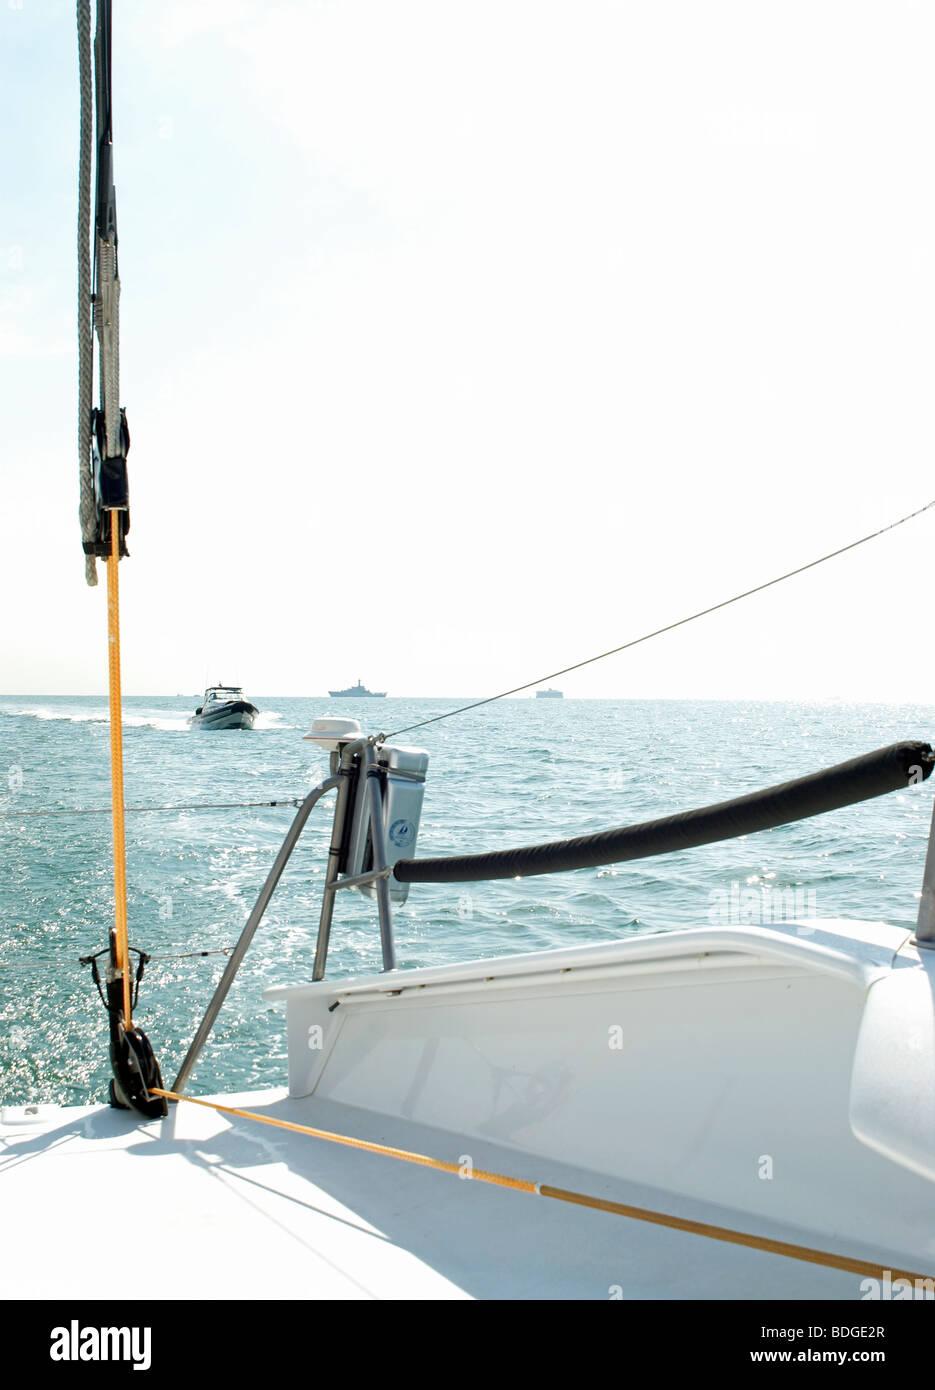 Polea de cuerda en velero Imagen De Stock